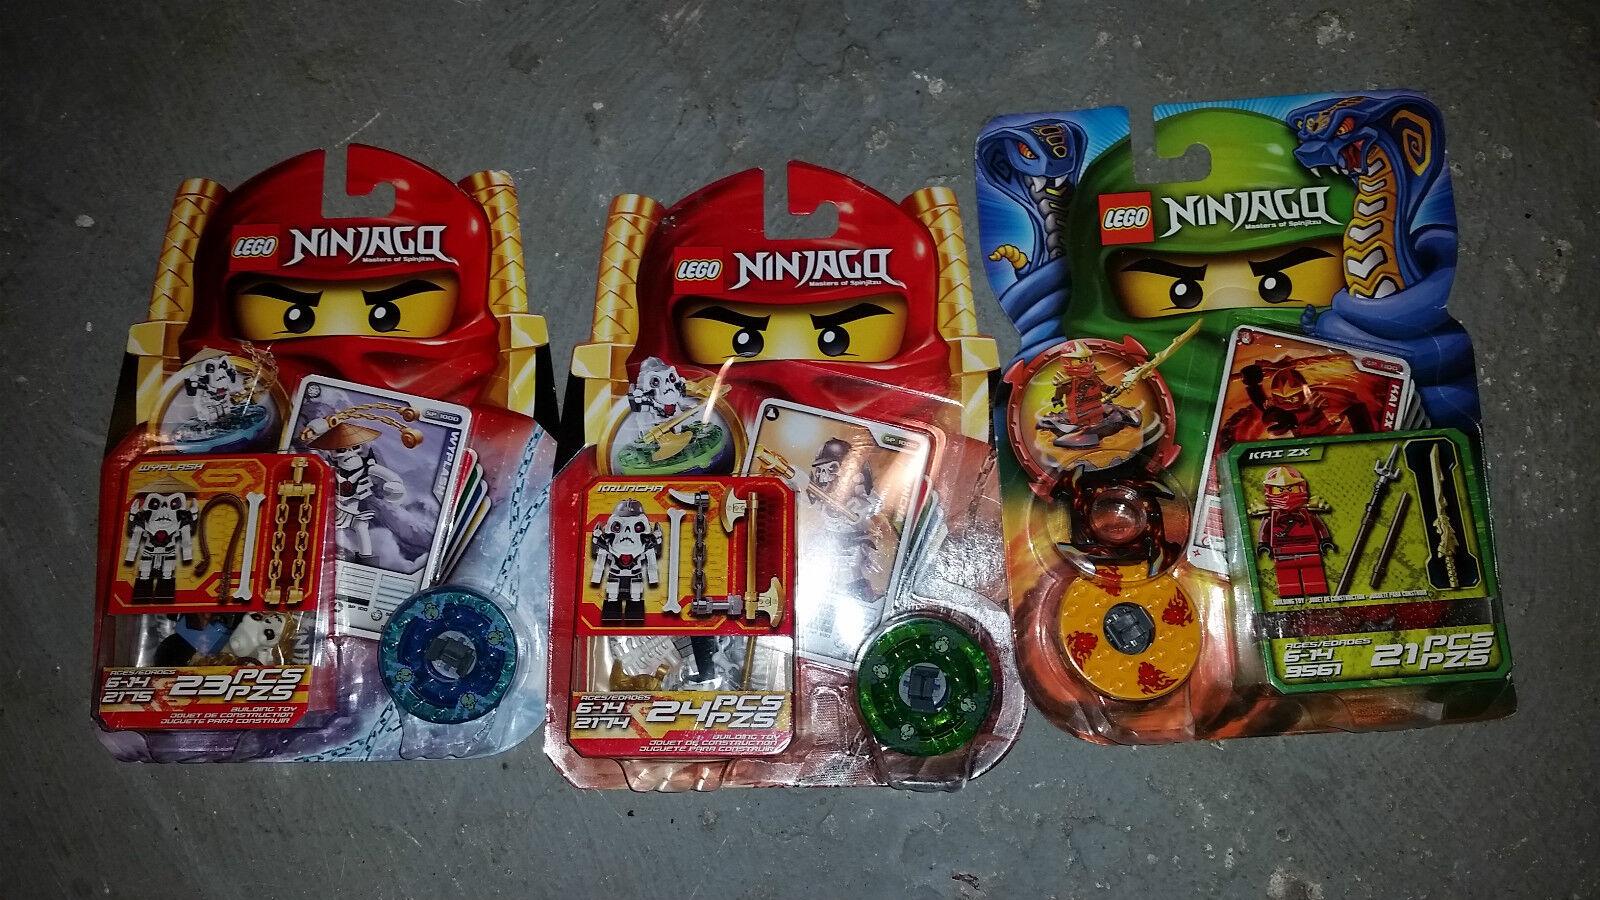 Lego NINJAGO Lot Wyplash Kai Kcorrerecha SPINJAGO Minicifra DRAGON  9561 2174 2175  Negozio 2018